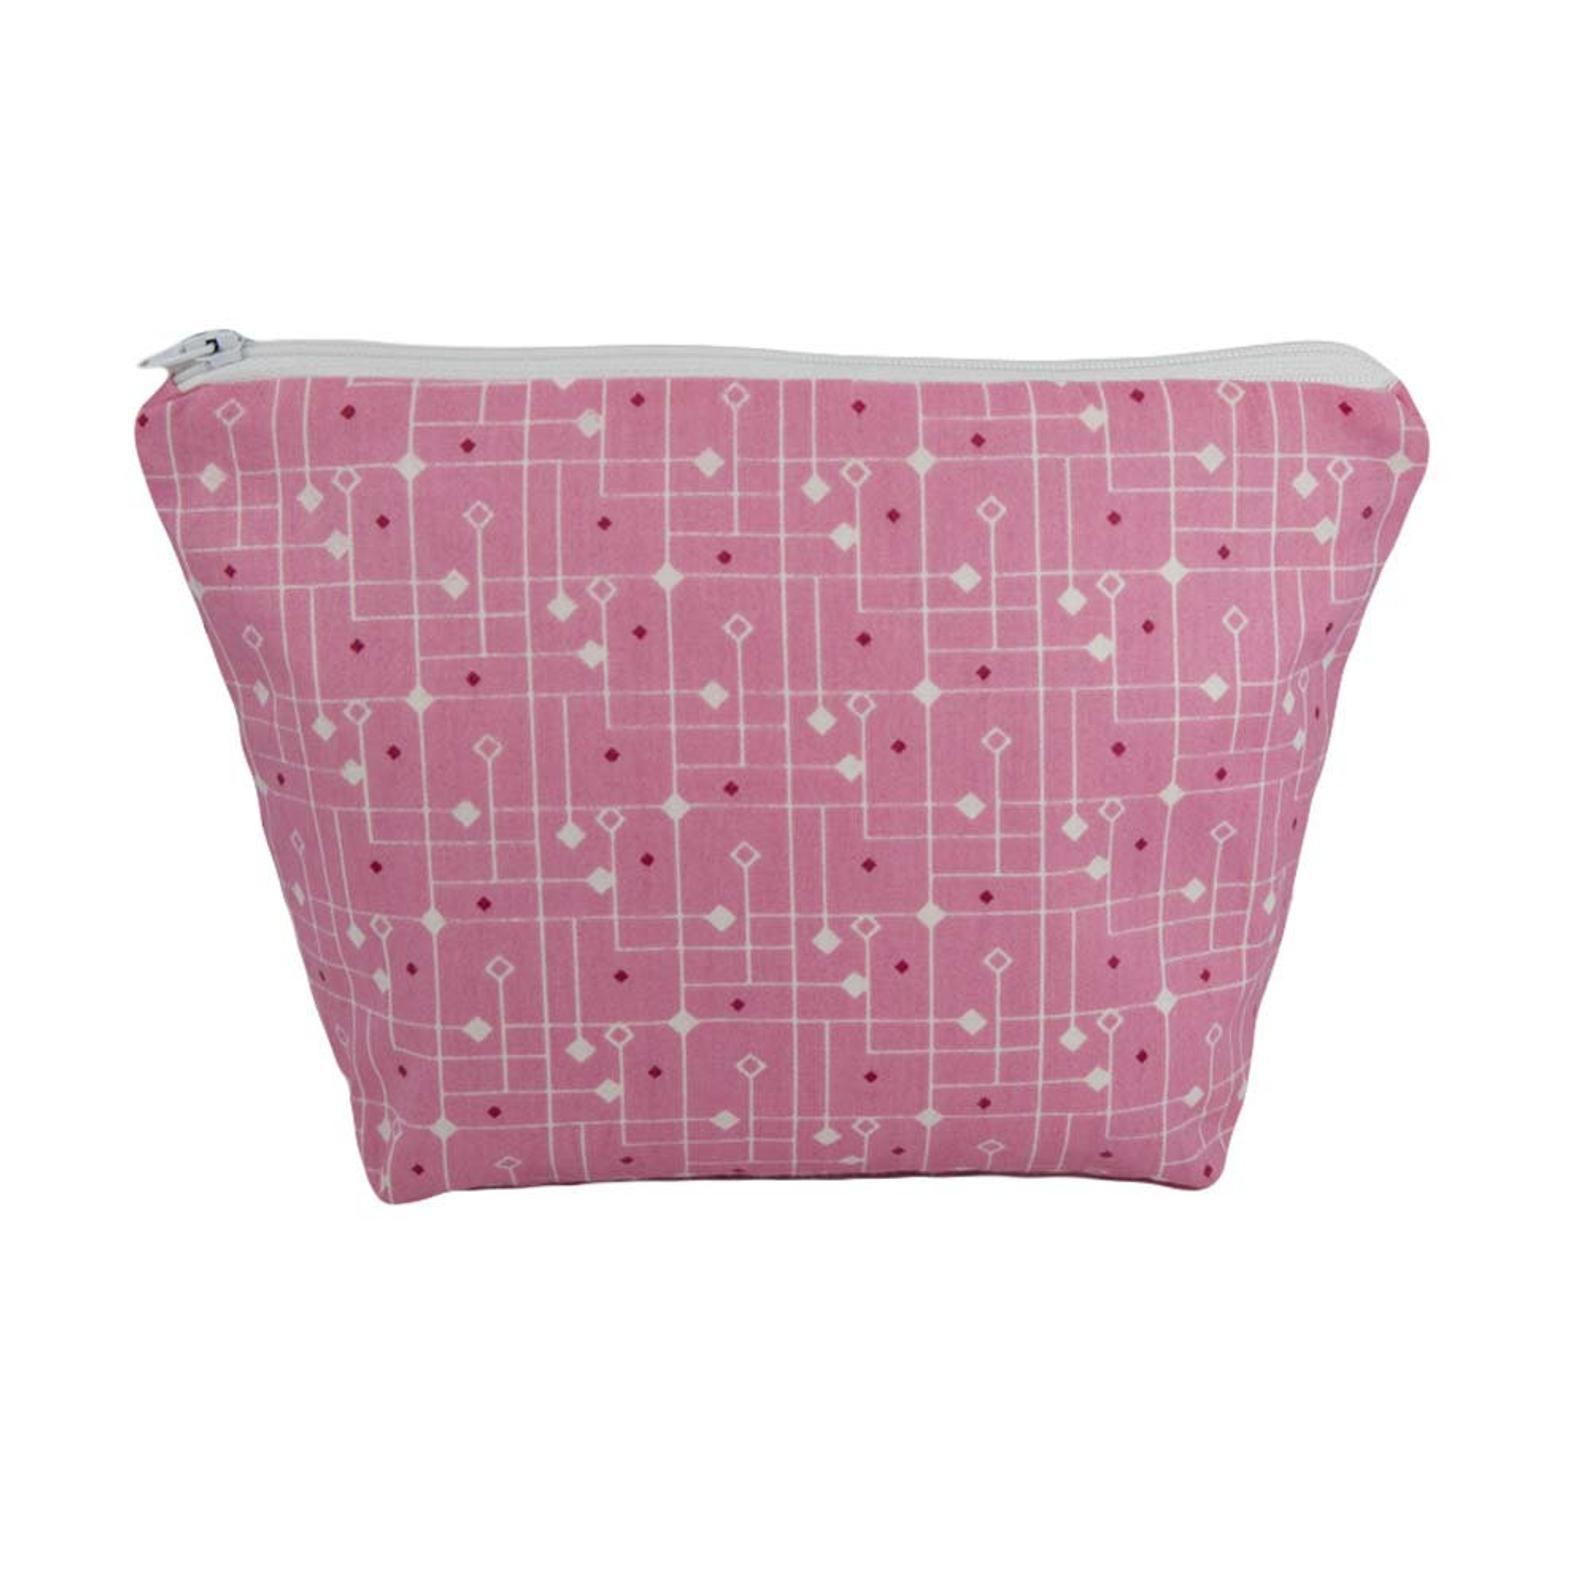 Pink Geometric Cosmetic Bag